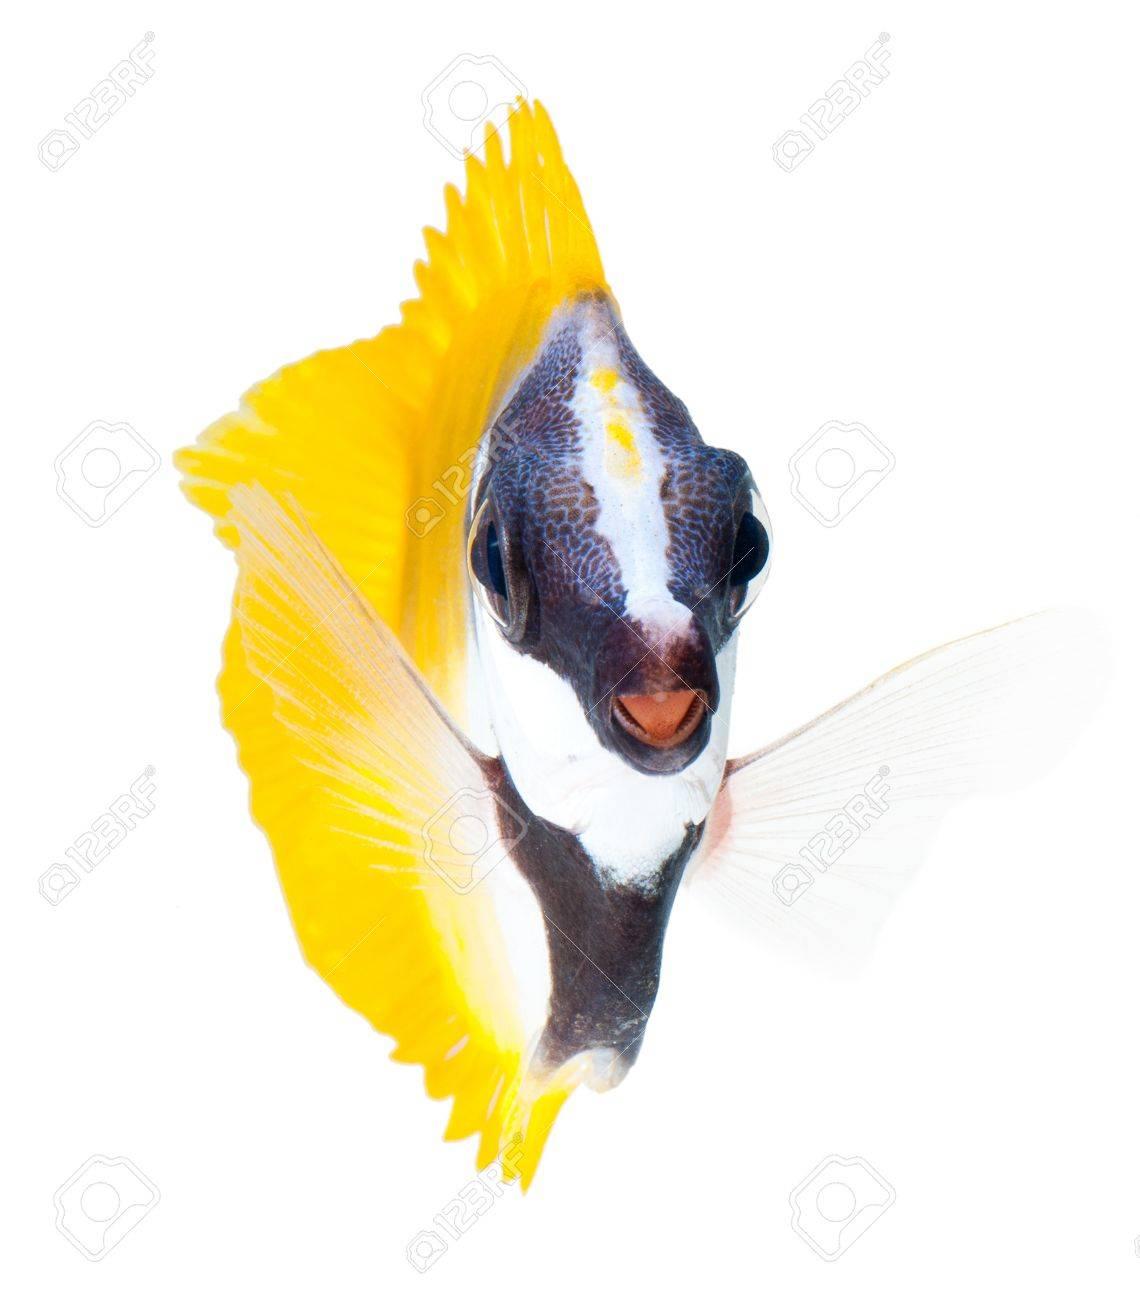 reef fish, foxface tabbitfish, isolated on white background Stock Photo - 11154887